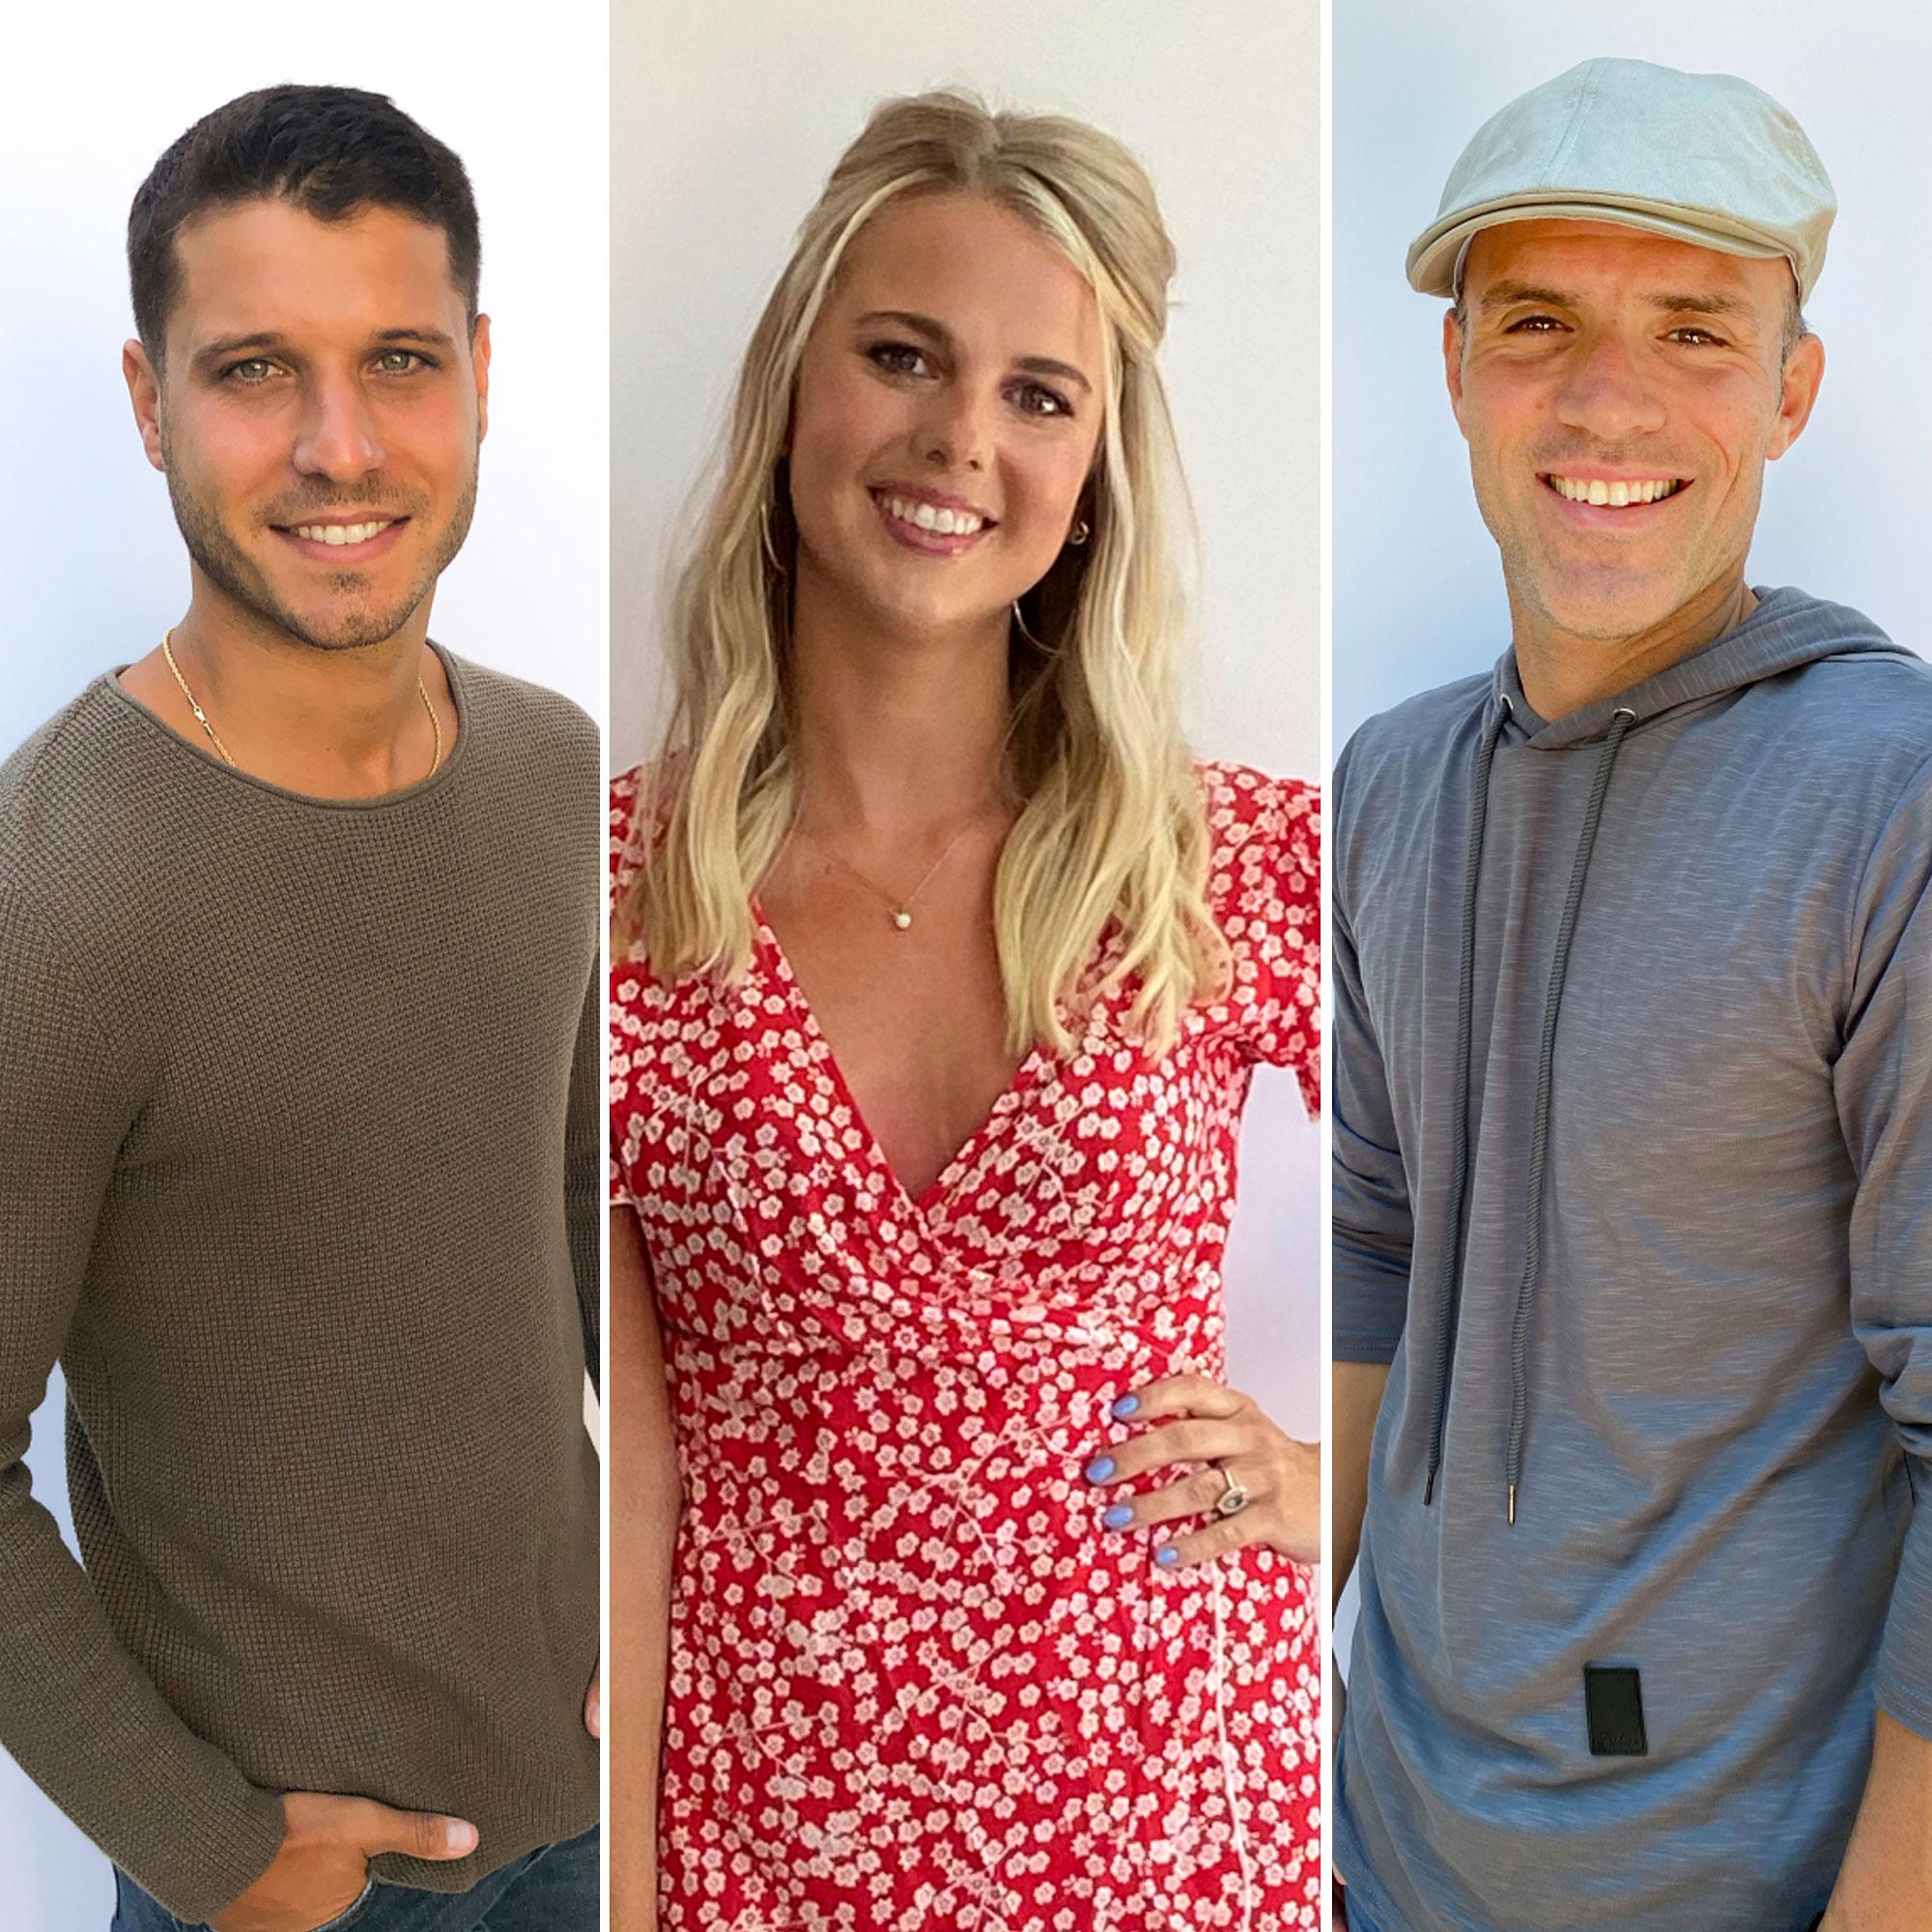 Who Won 'Big Brother: All-Stars' Season 22? Cody, Nicole or Enzo?